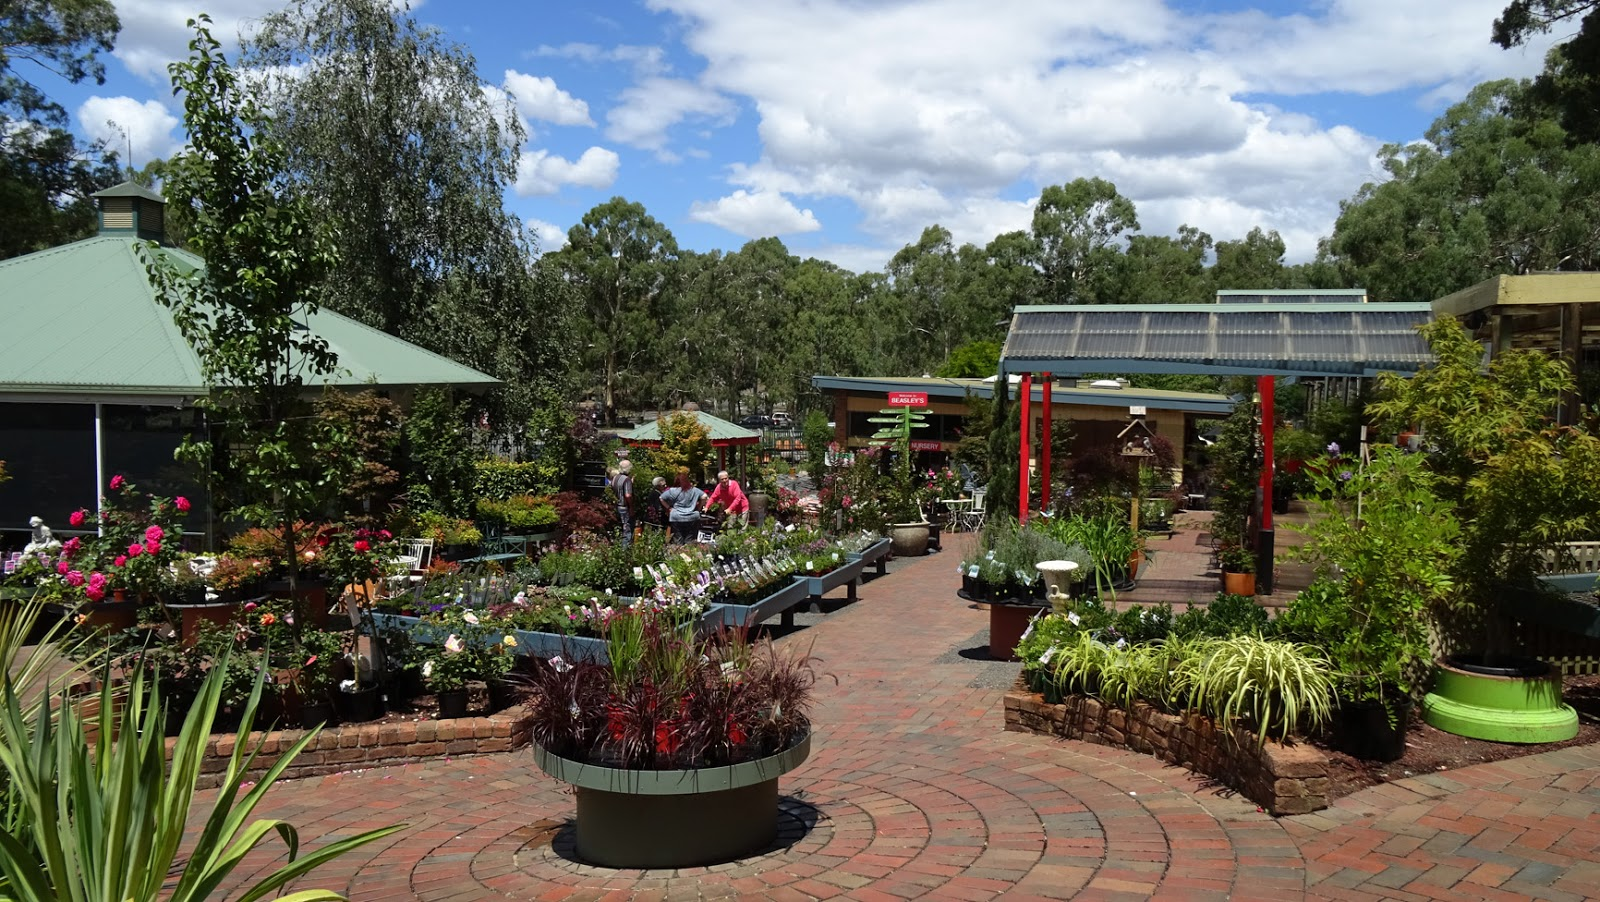 Melbourne fresh daily melbourne nurseries for Landscape design courses melbourne